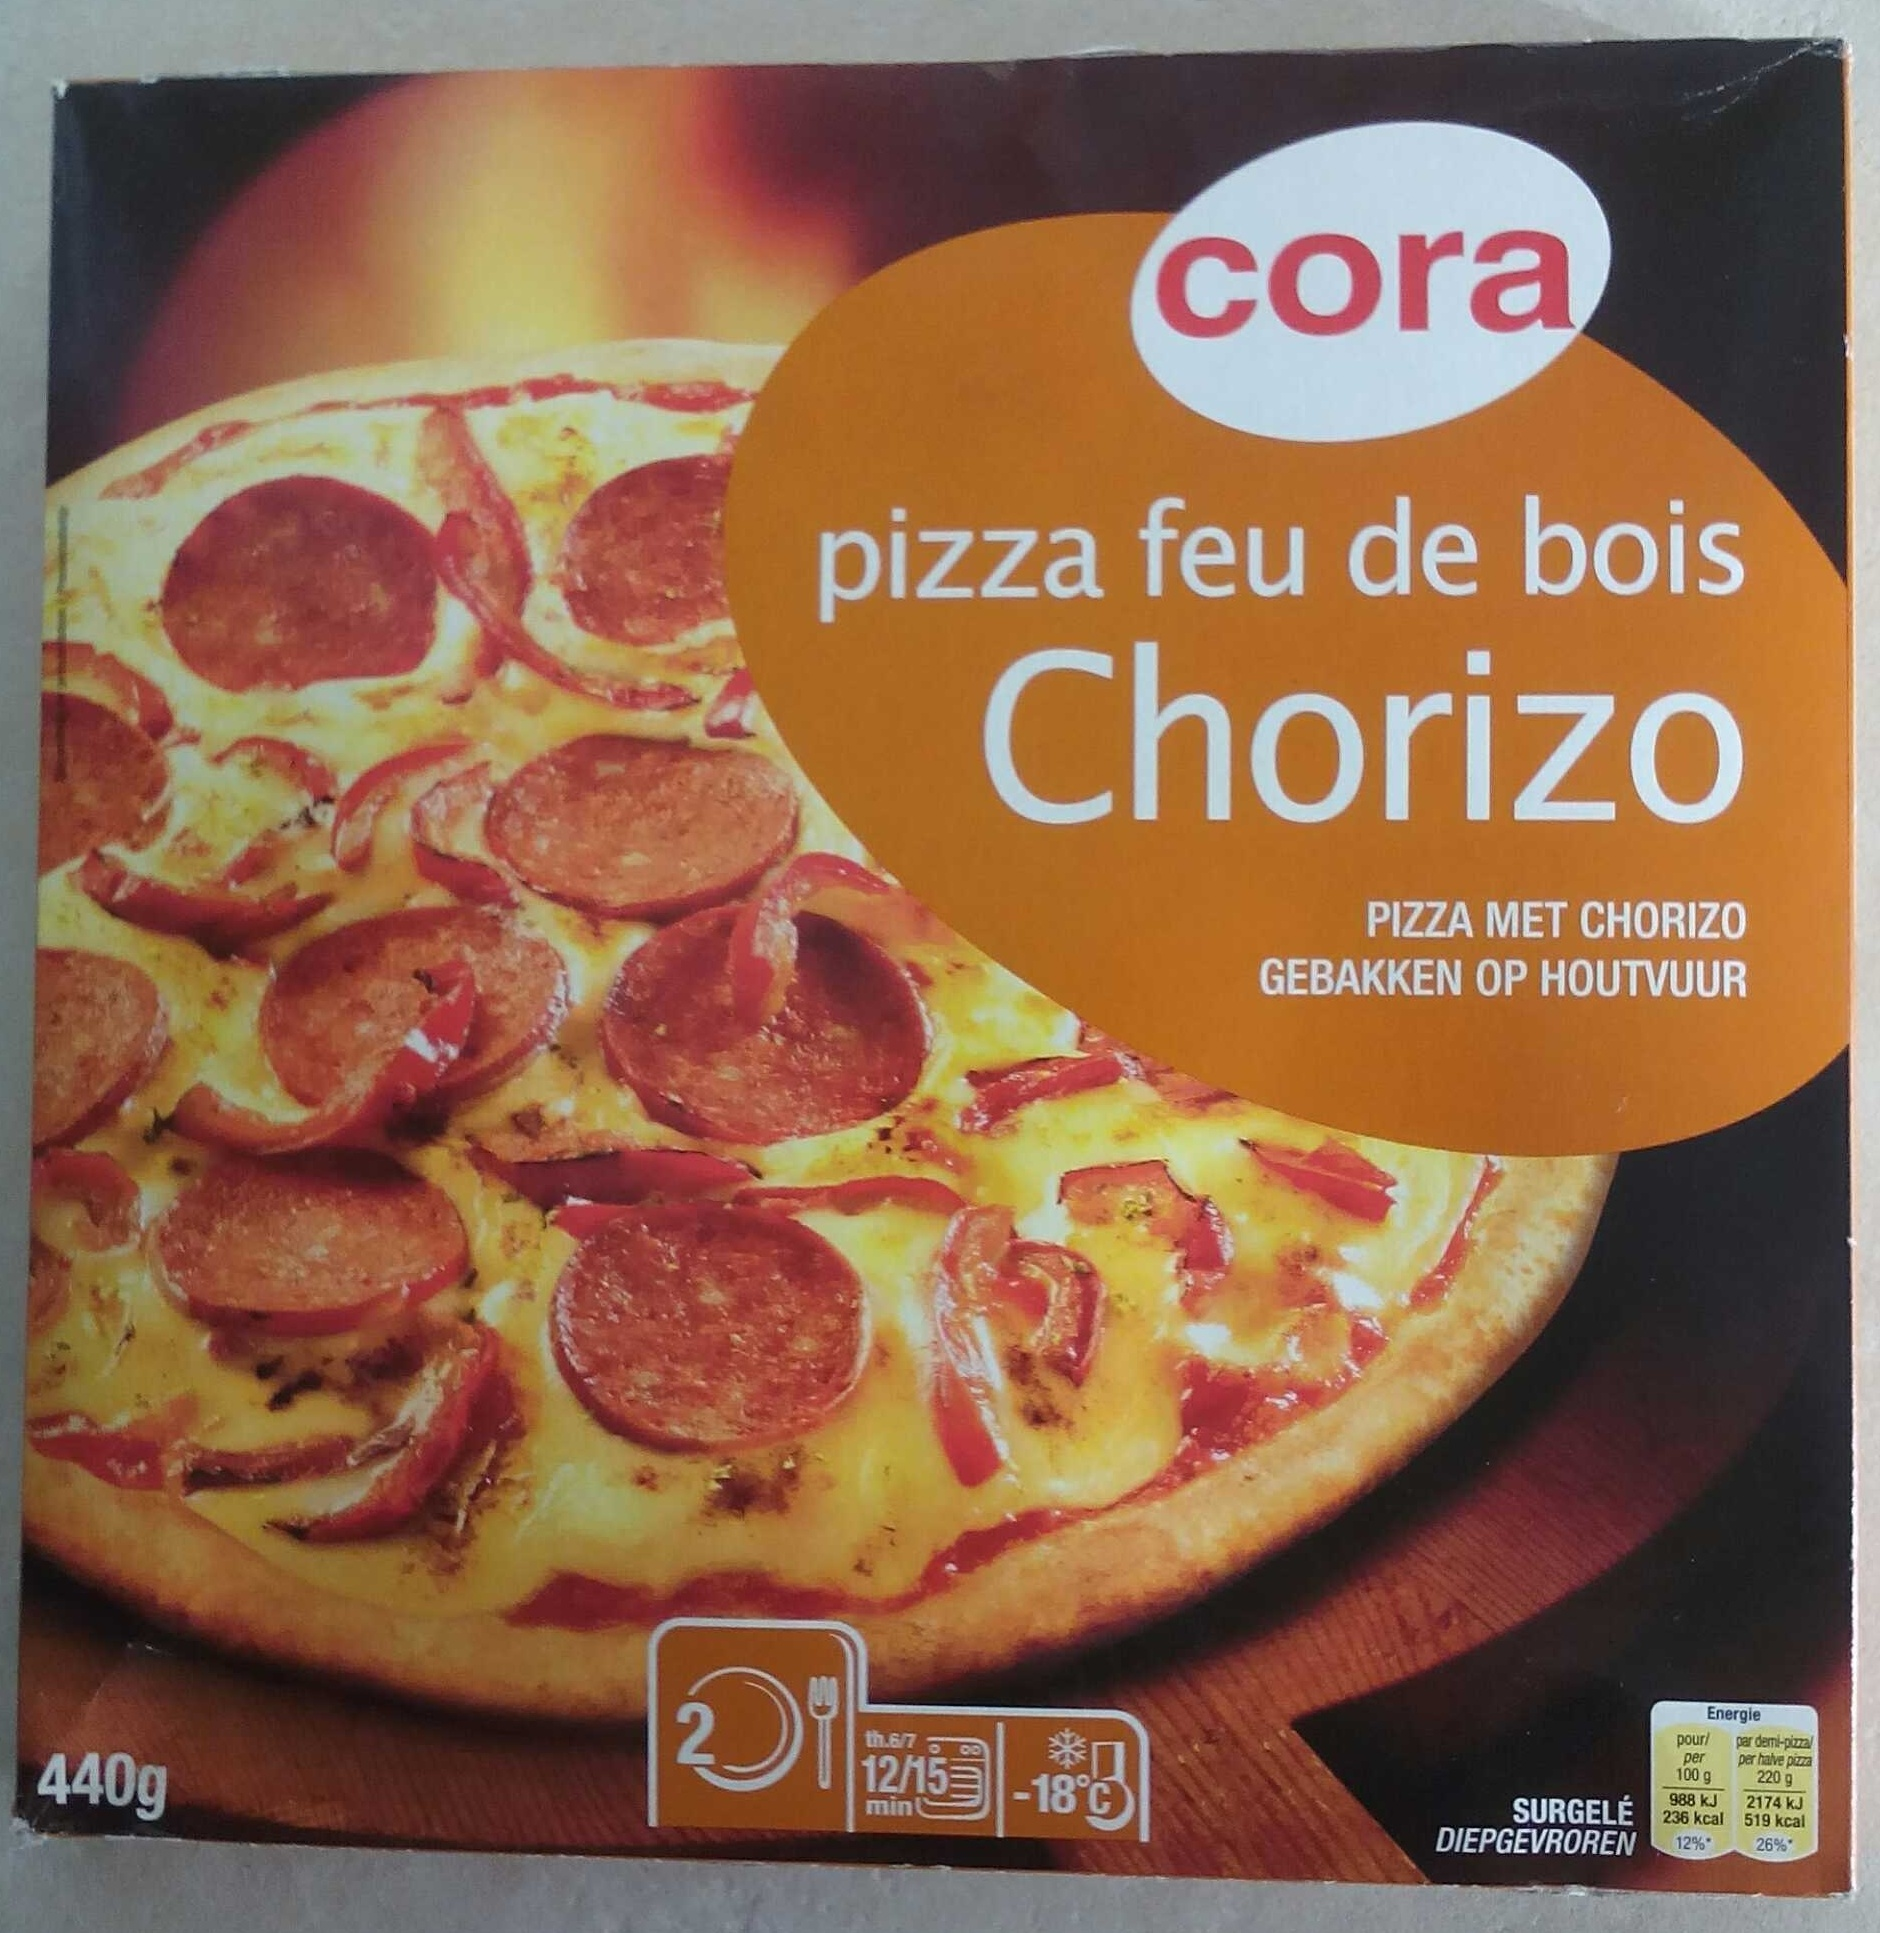 Pizza feu de bois Chorizo Cora 440 g # Pizza Feu De Bois Nancy